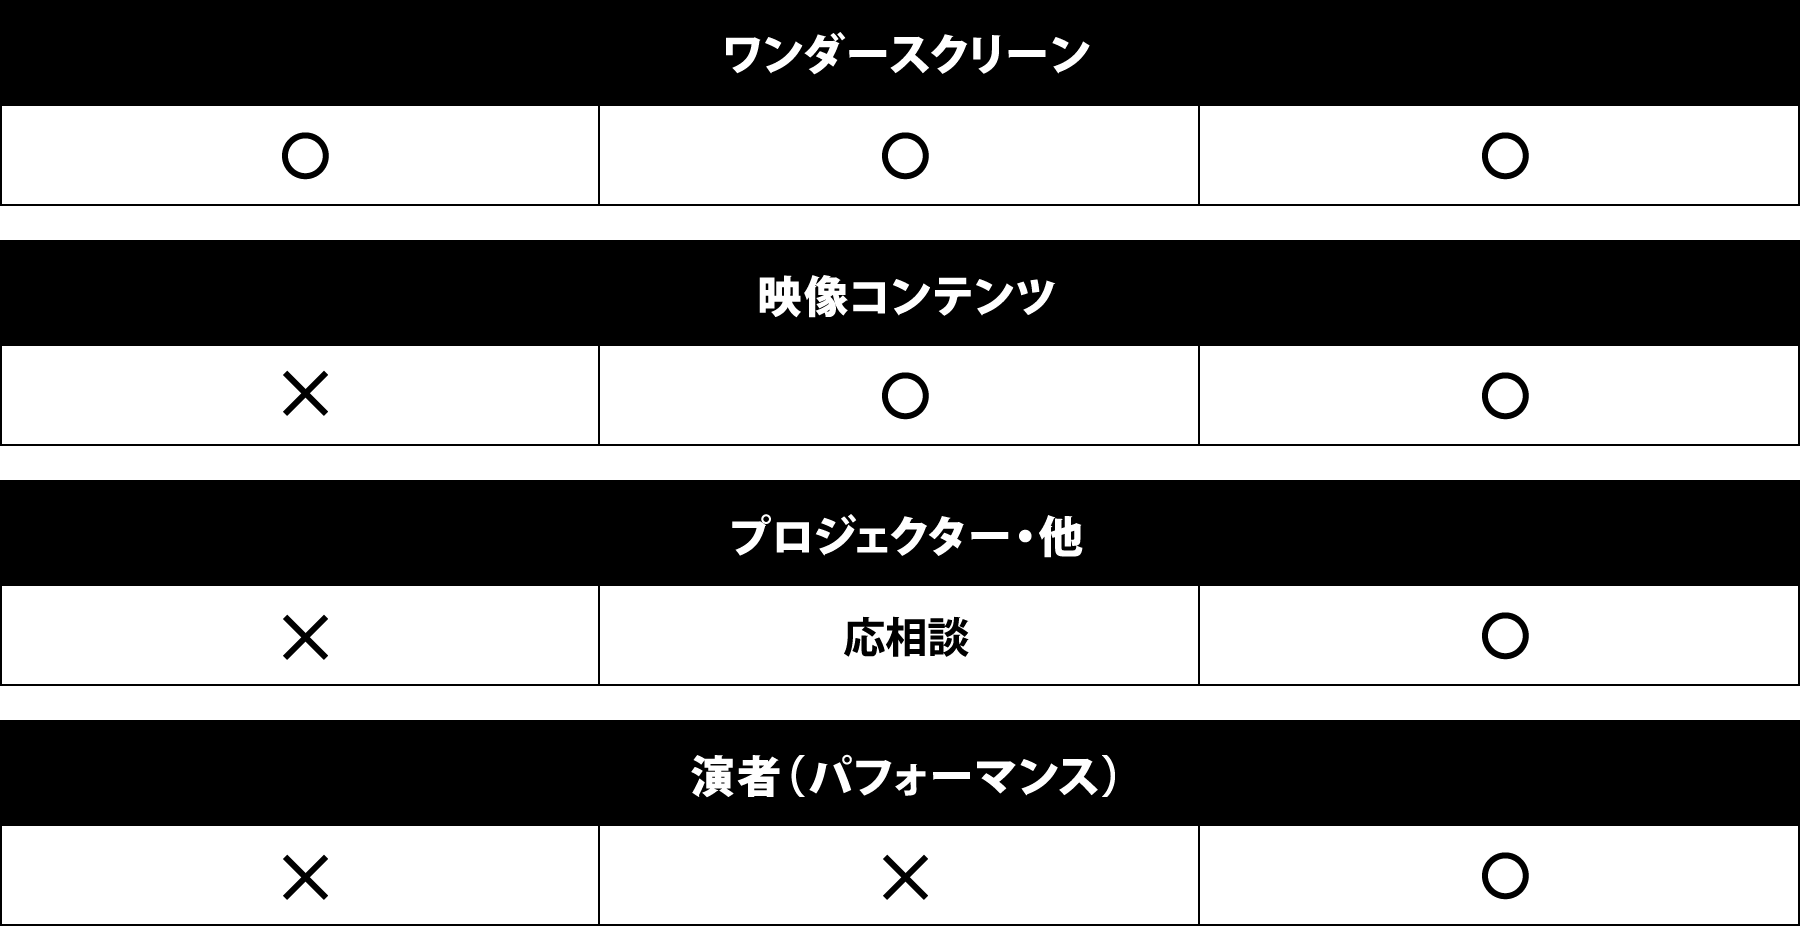 PHスクリーン 映像コンテンツ 演者(パフォーマンス) トラス・他機器全般